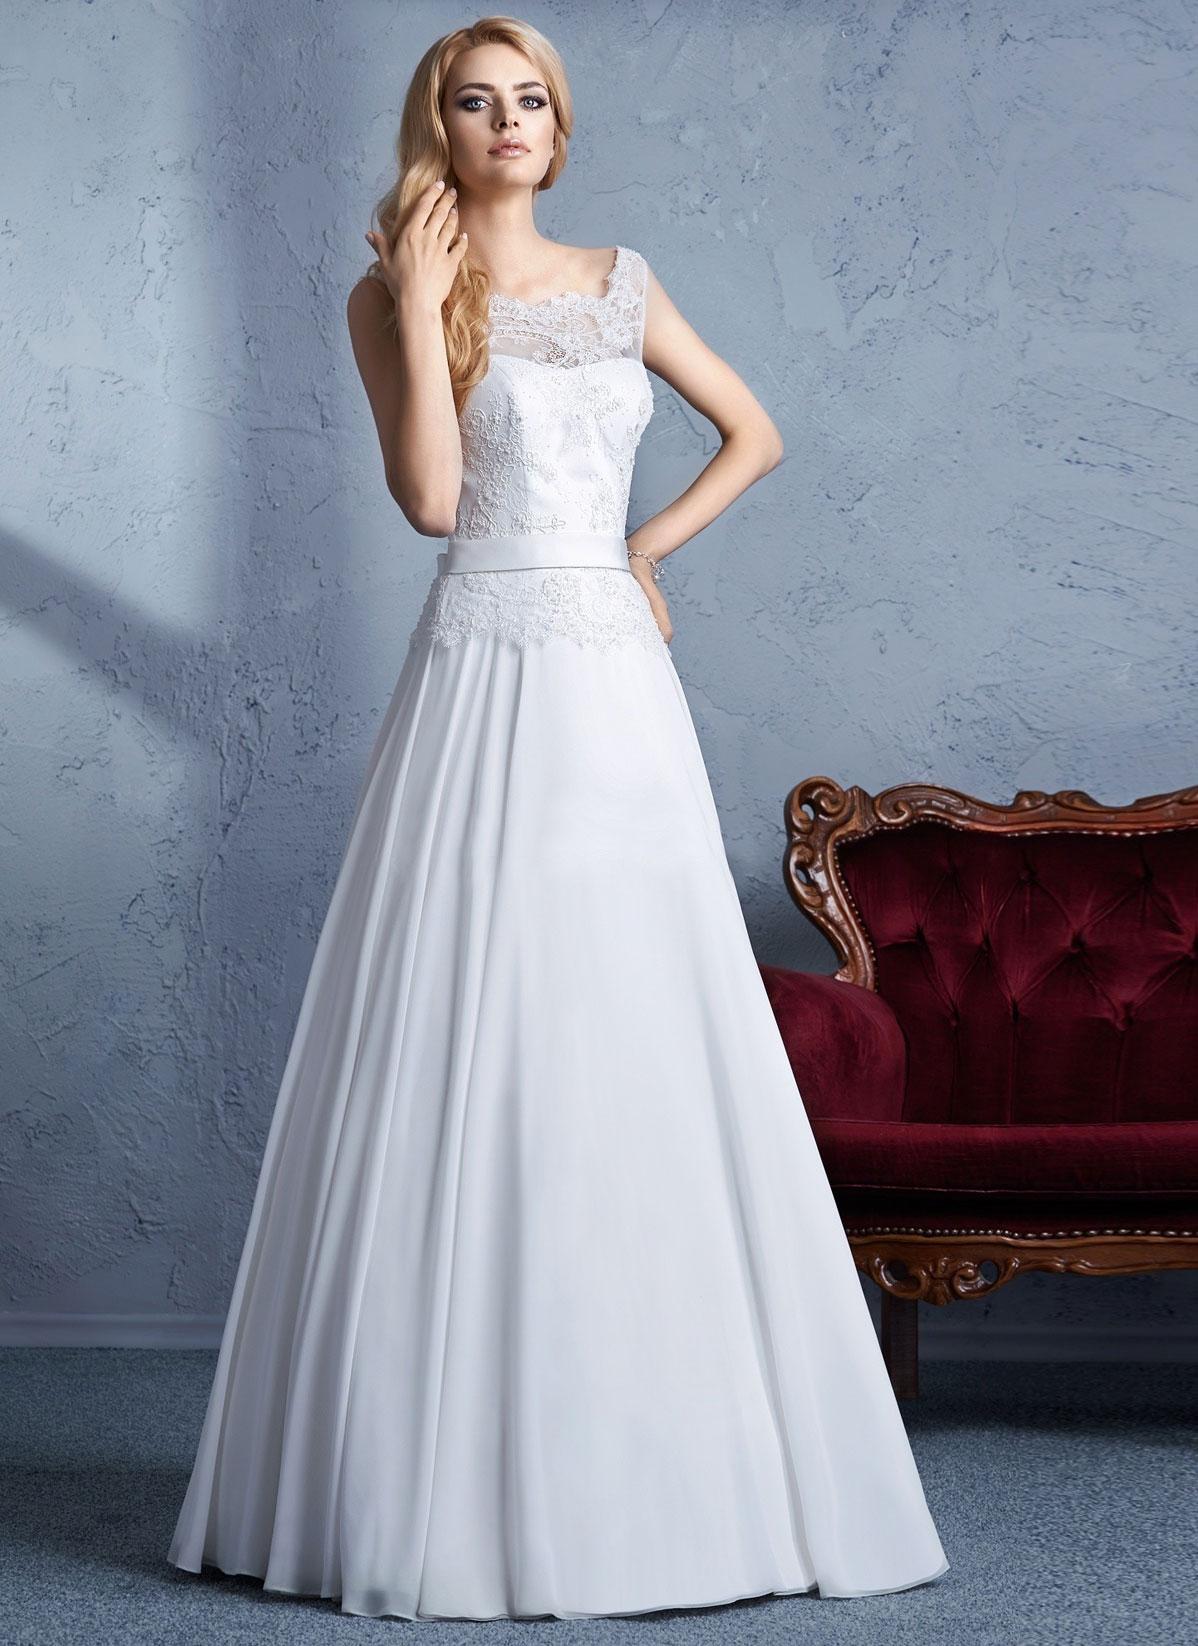 Herm&#8217;s Bridal <br> Monna